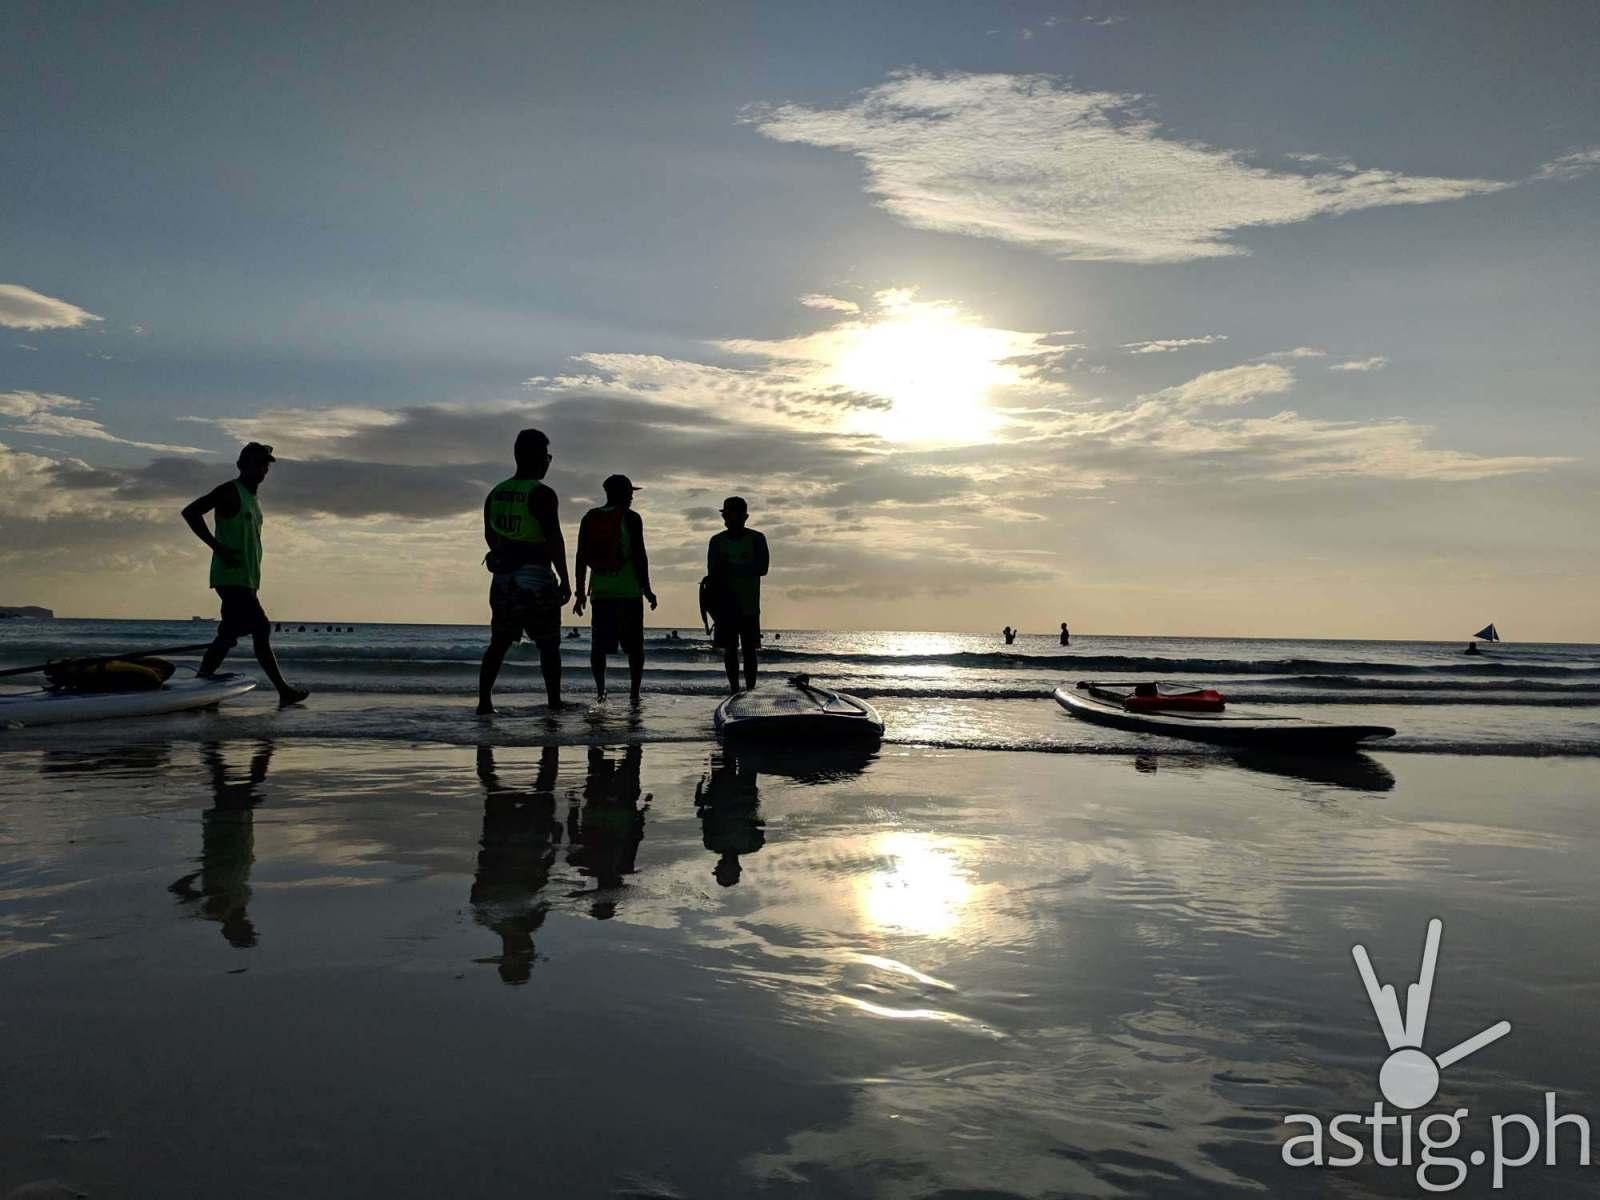 Reflection - Boracay Philippines re-opening smartphone photo - ASUS ZenFone 5 by Den Uy of TechKuya